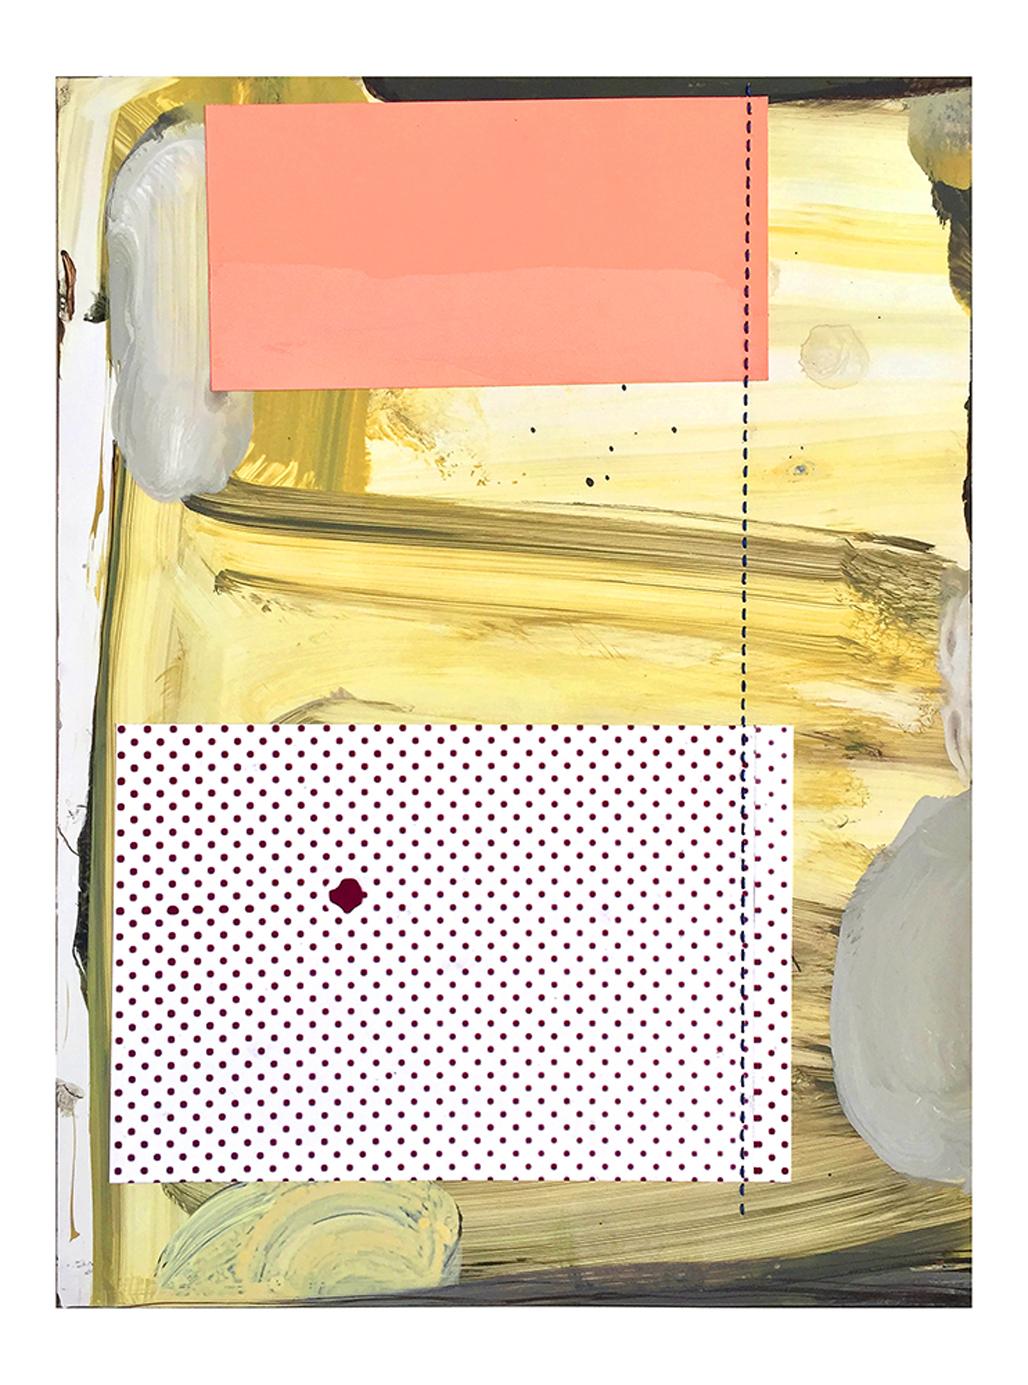 acrylic, collage on yponpaper 33 x 26,5 cm